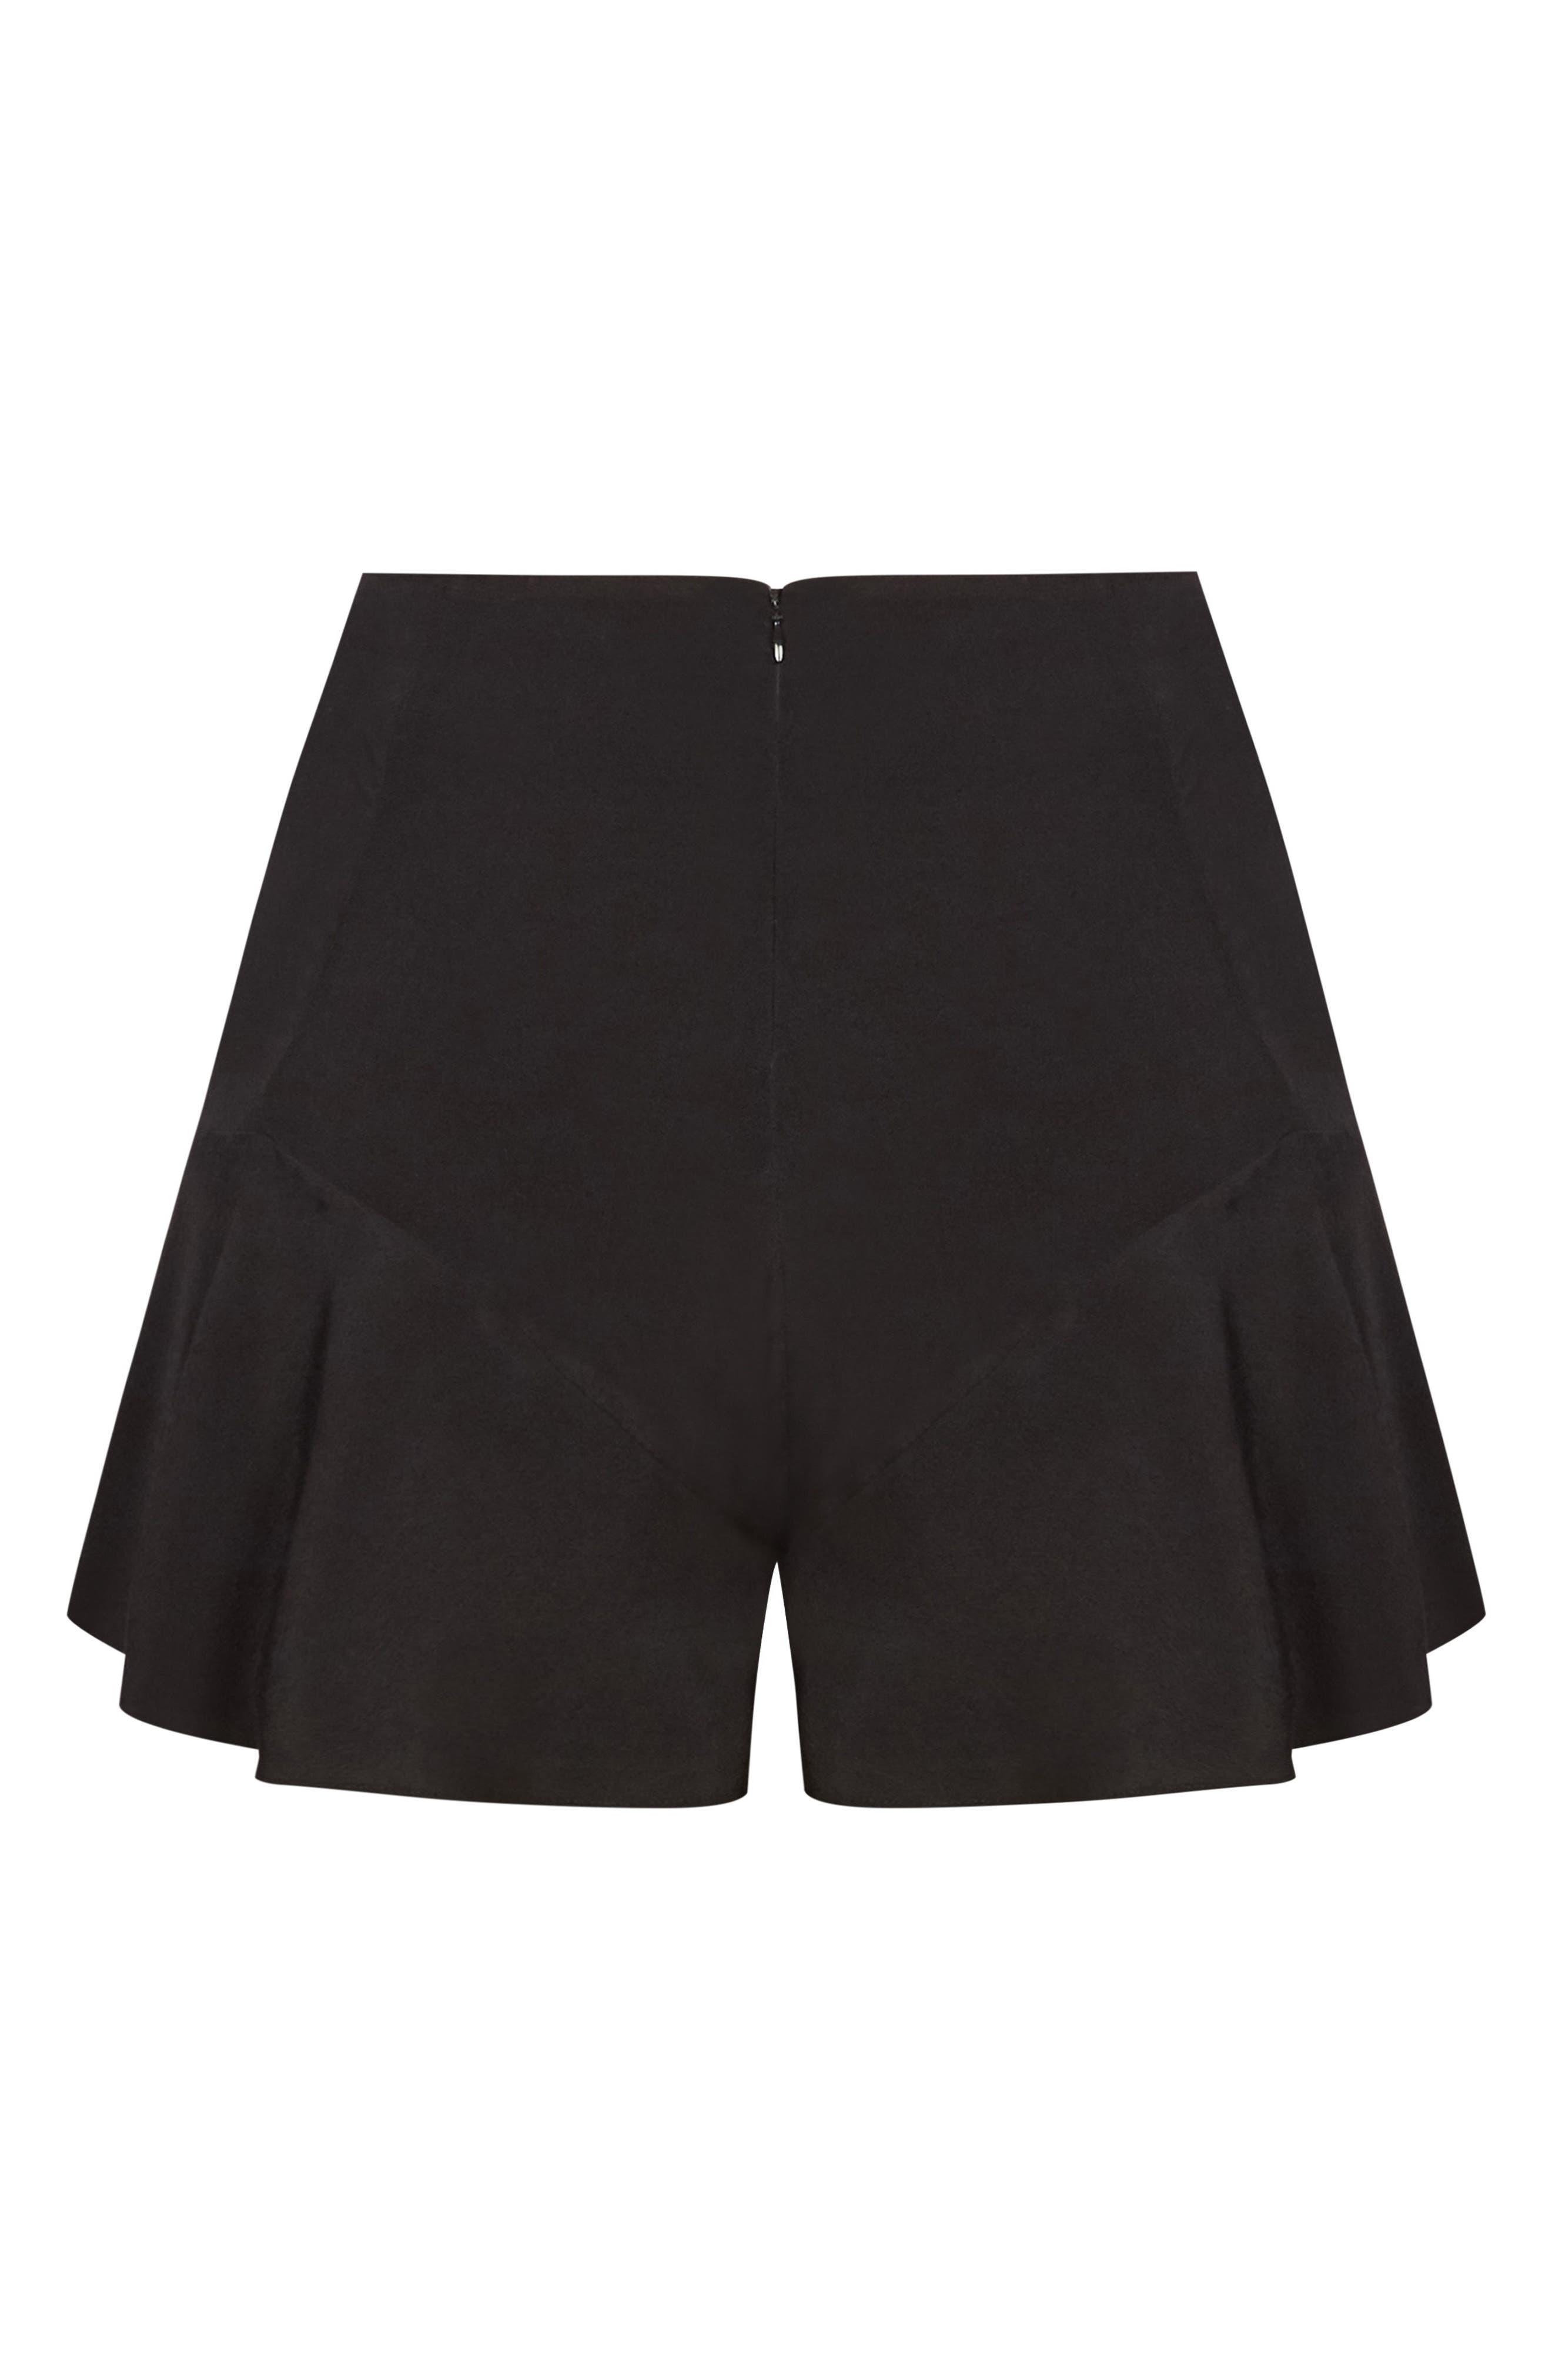 CITY CHIC,                             High Rise Ruffle Hem Shorts,                             Alternate thumbnail 3, color,                             014